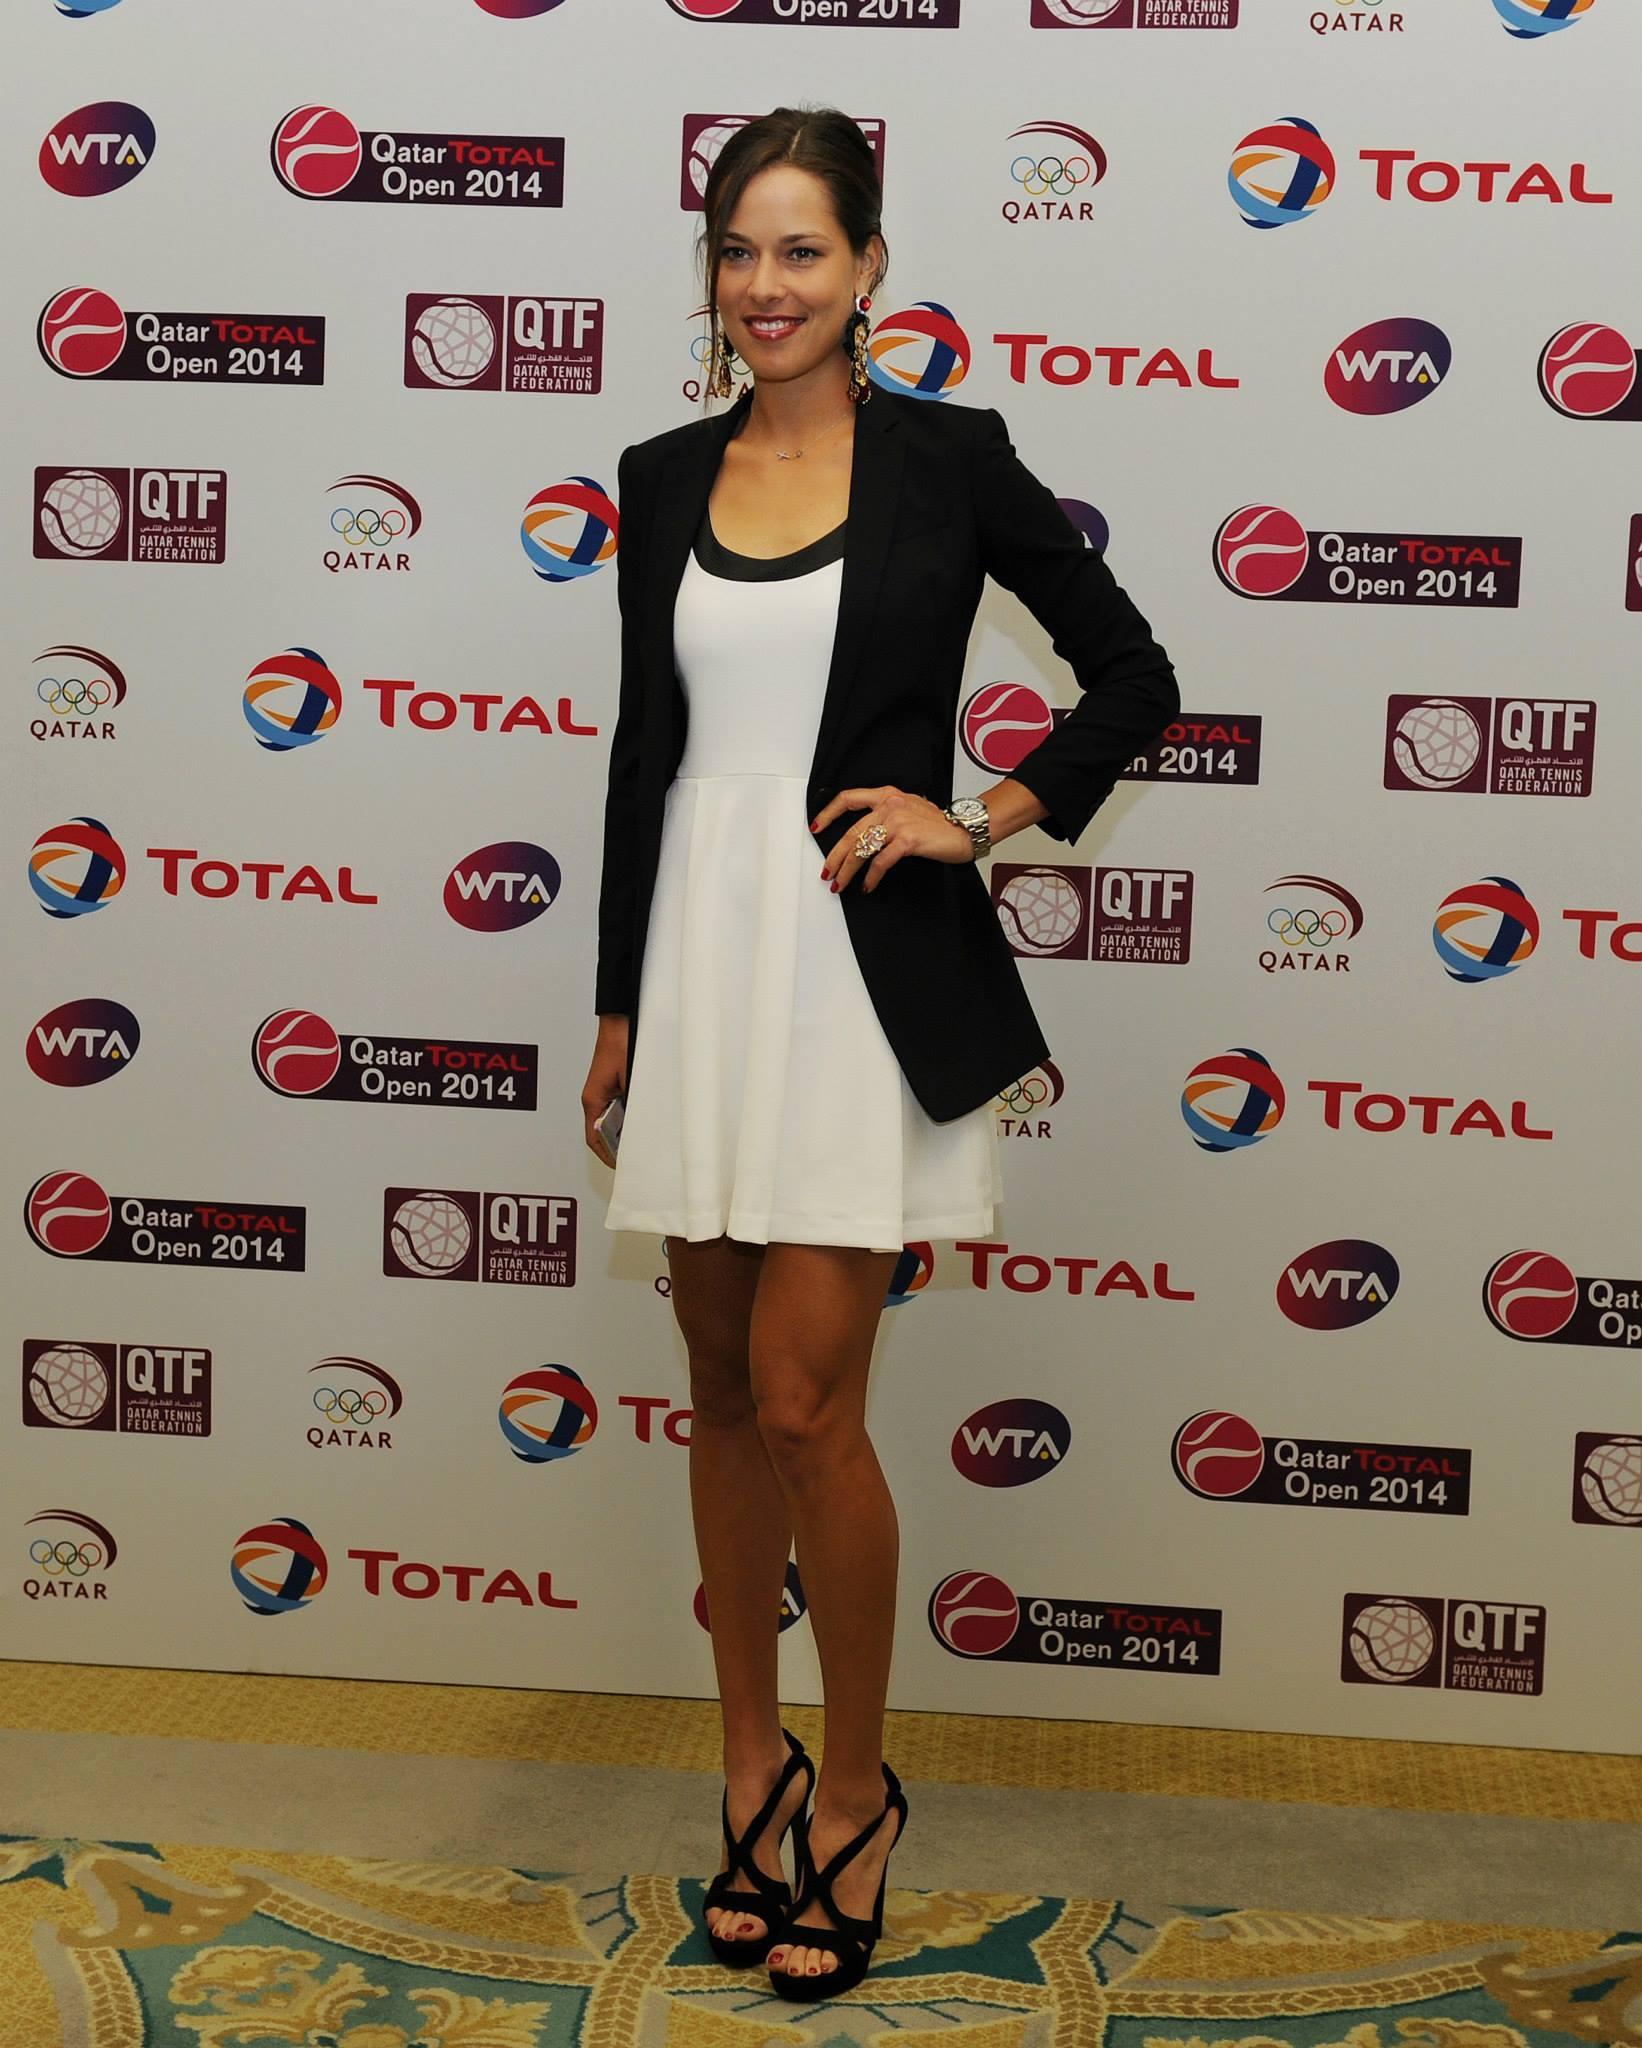 Sexy tennis beauties ivanovic wozniacki sharapova - 3 part 5